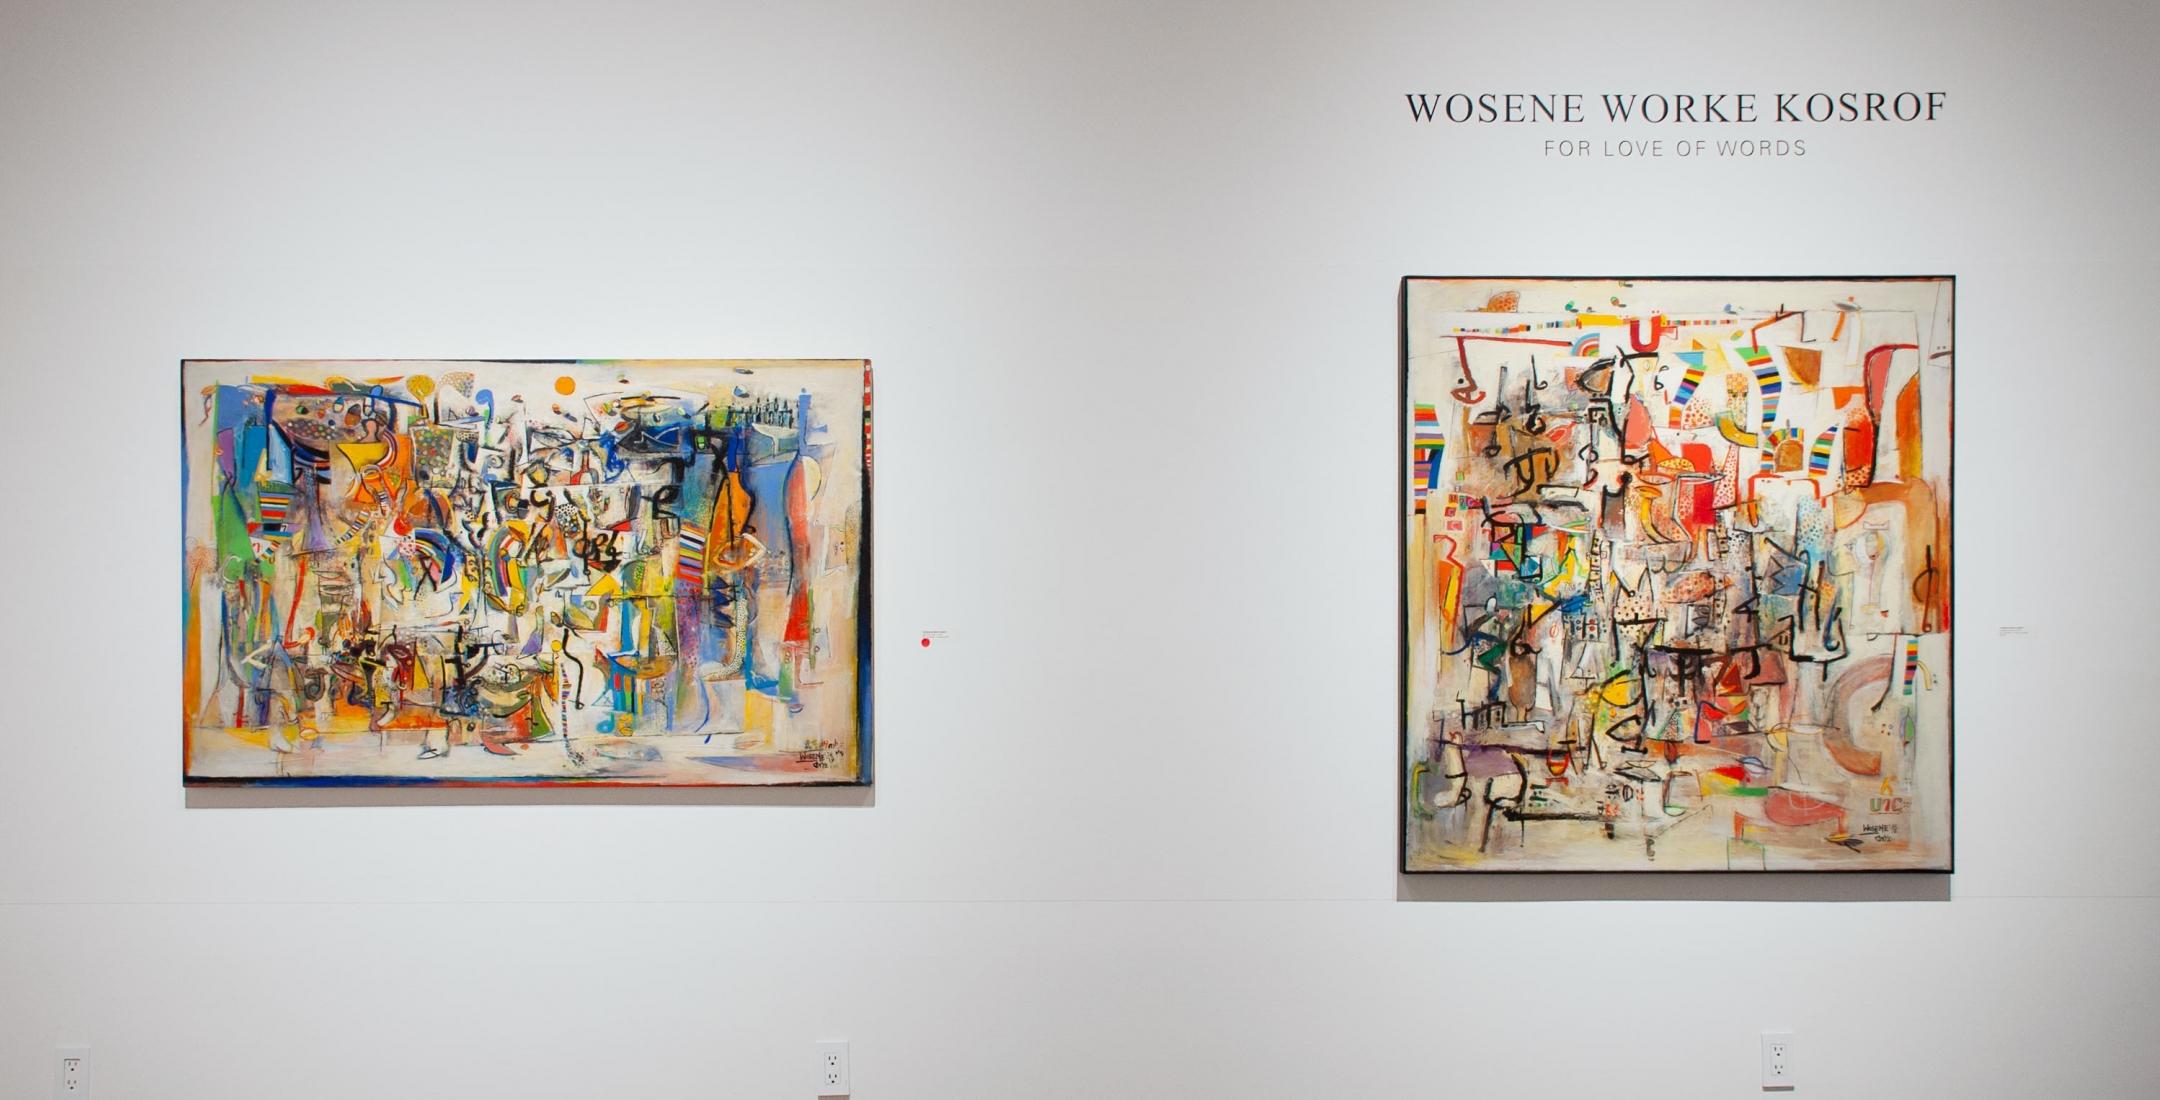 Installation photograph of WOSENE WORKE KOSROF: For Love of Words